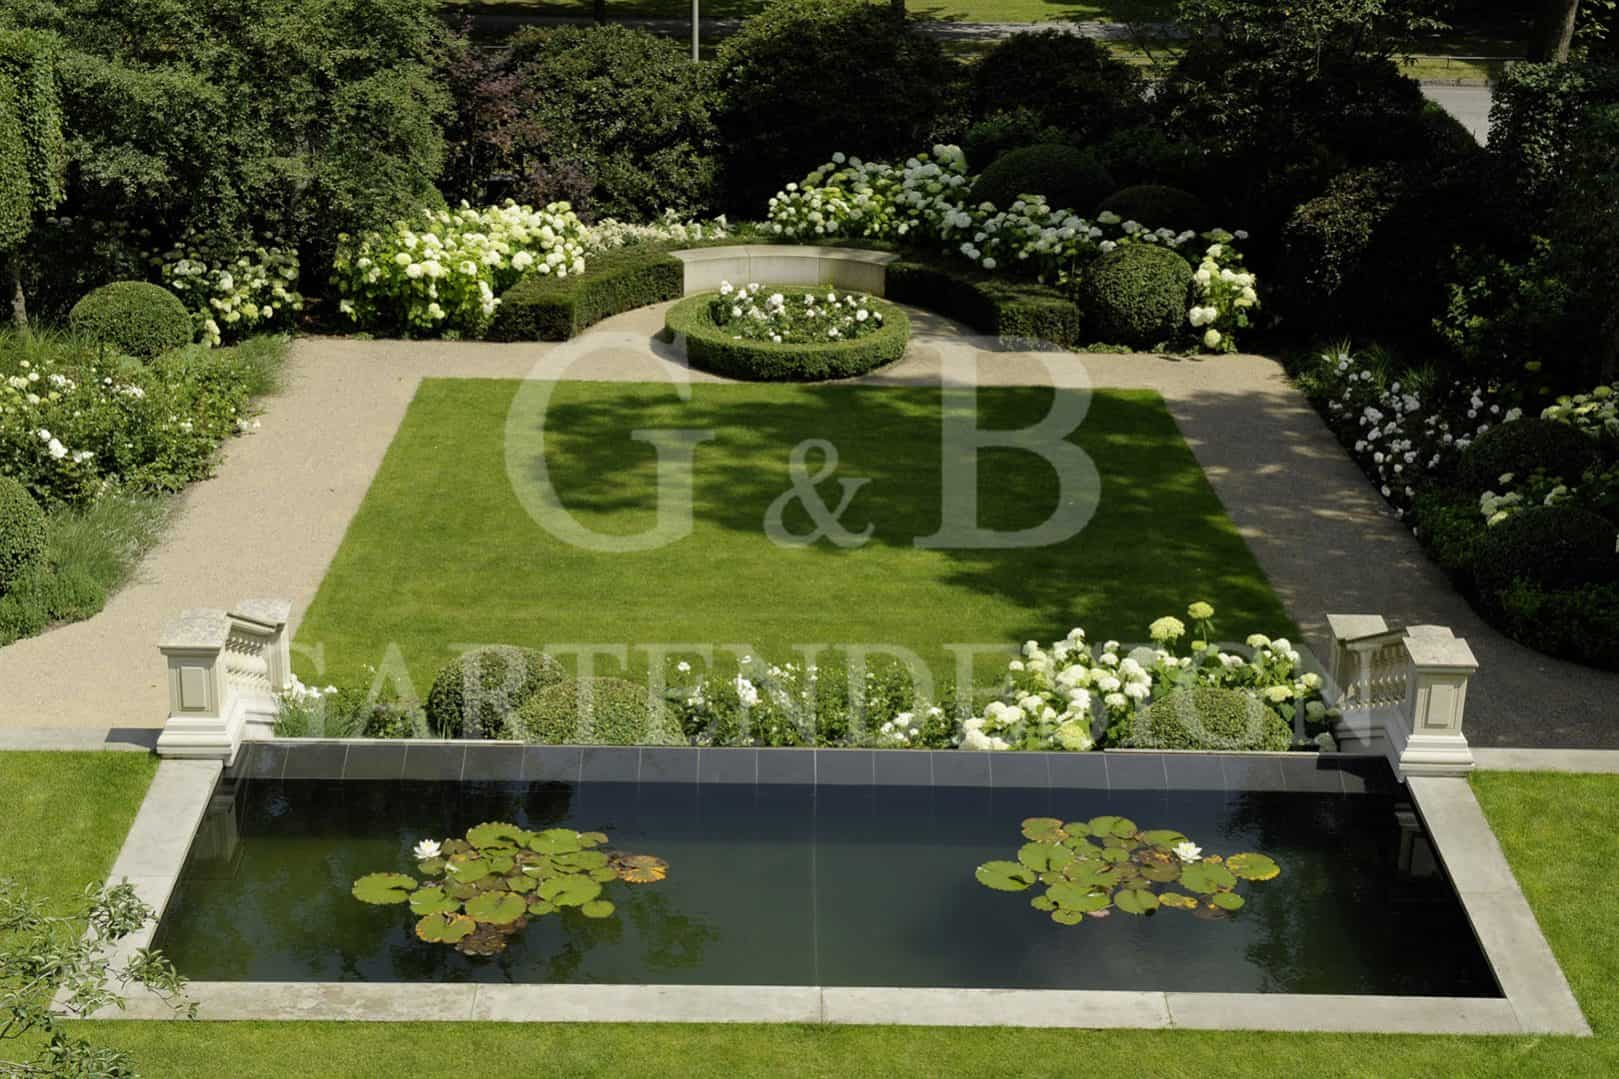 Gartenbau landschaftsbau gempp gartendesign for Gartenbau hamburg